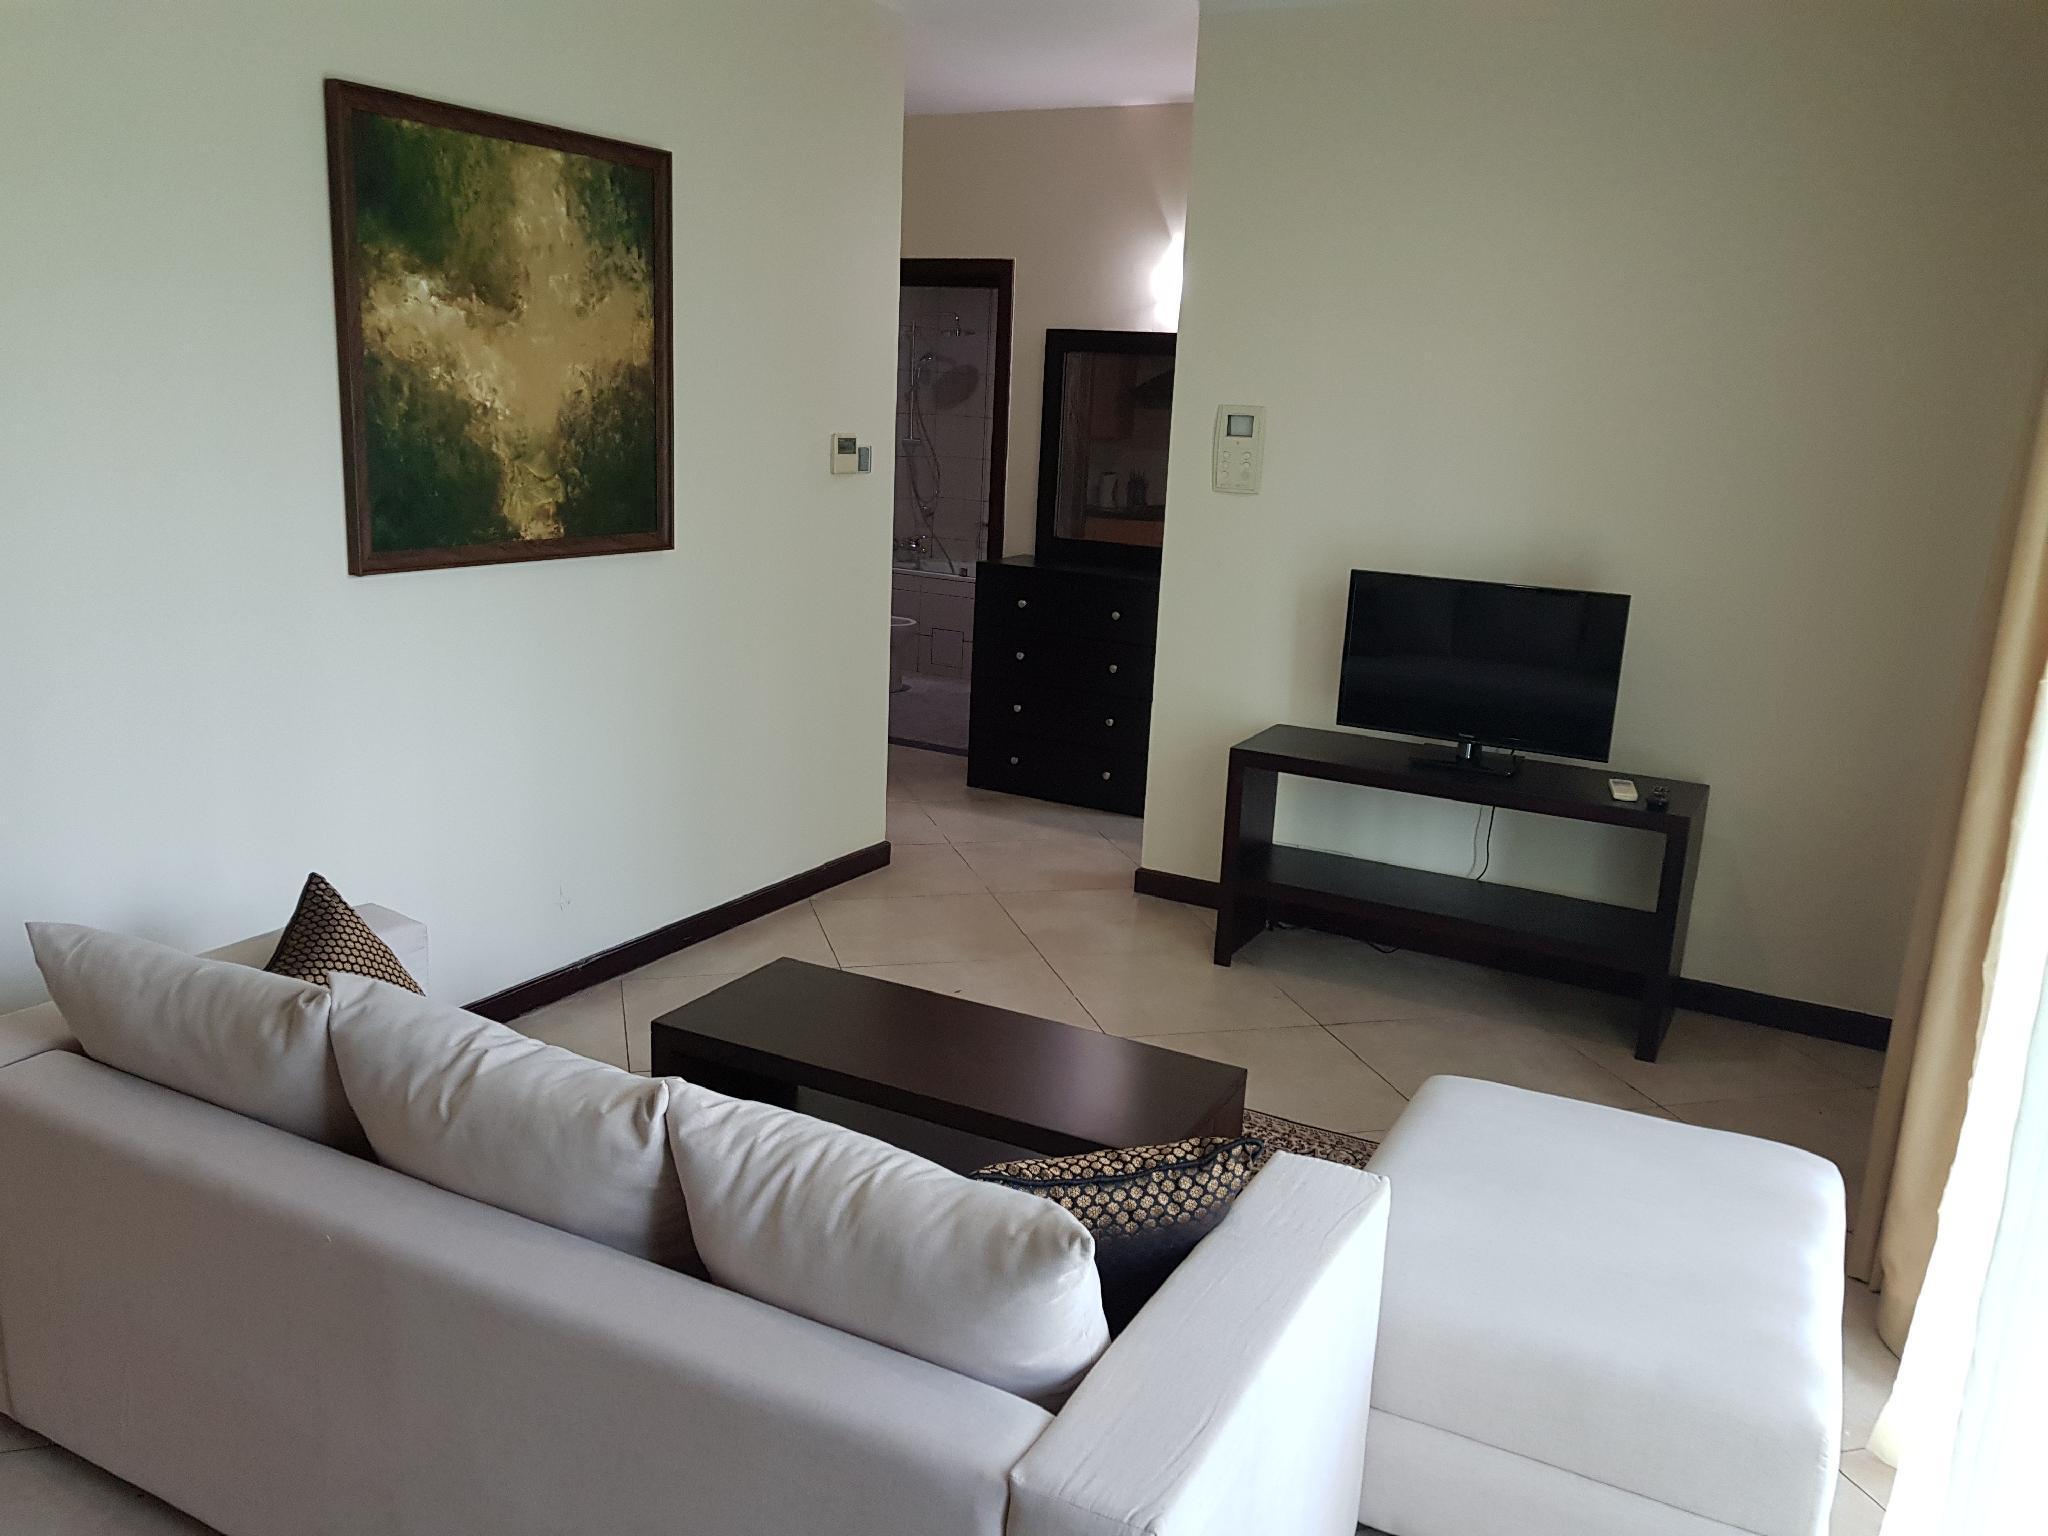 Iceland Apartments Colombo 03 Colombo Sri Lanka